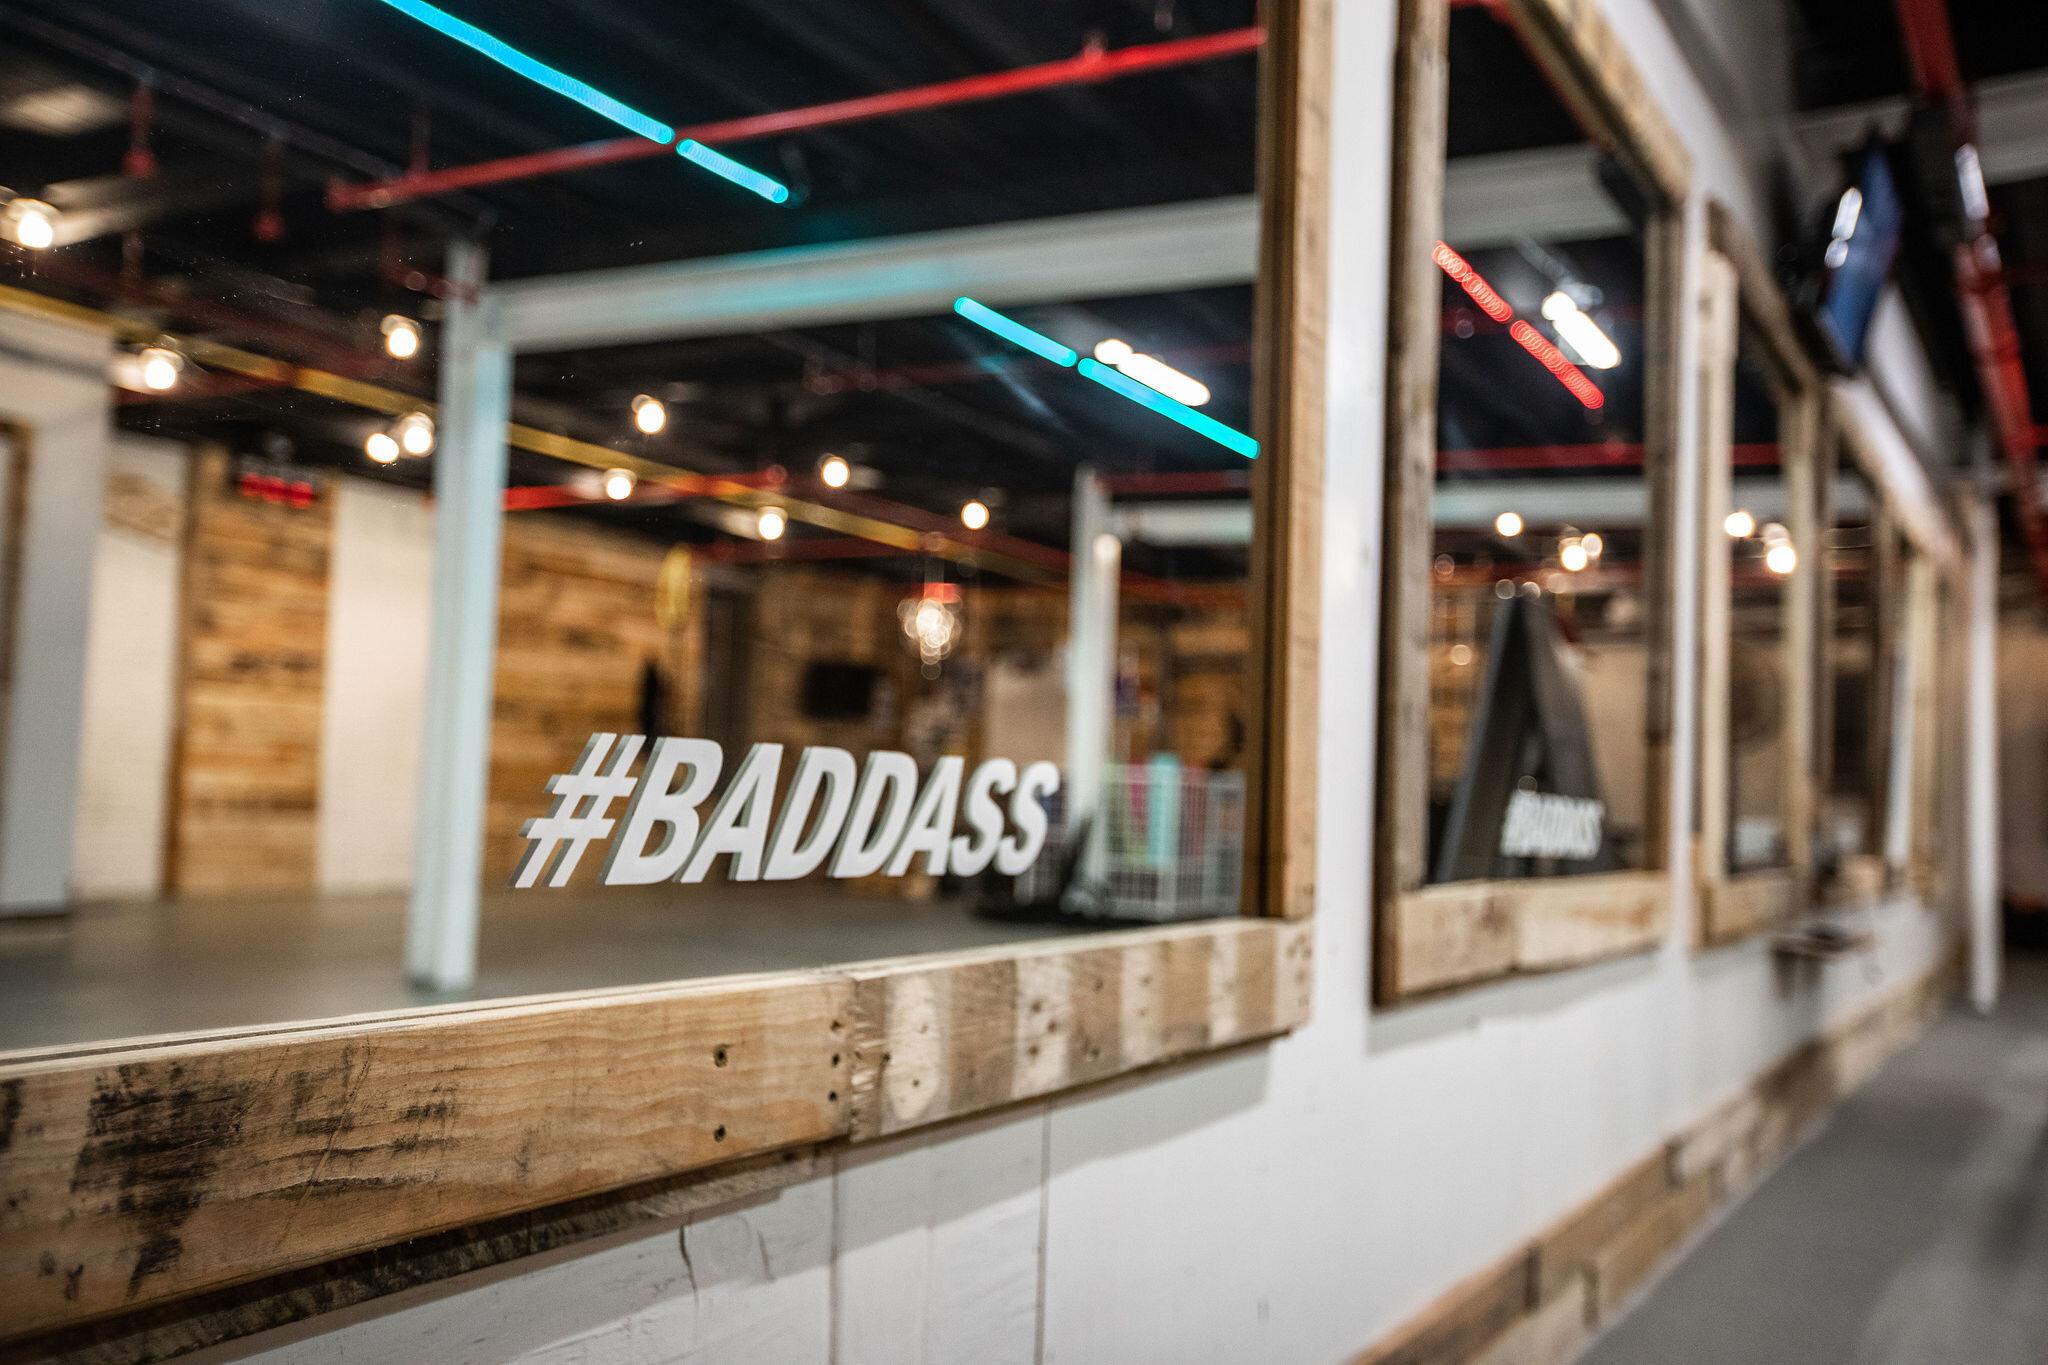 Baddass-4912019.jpg